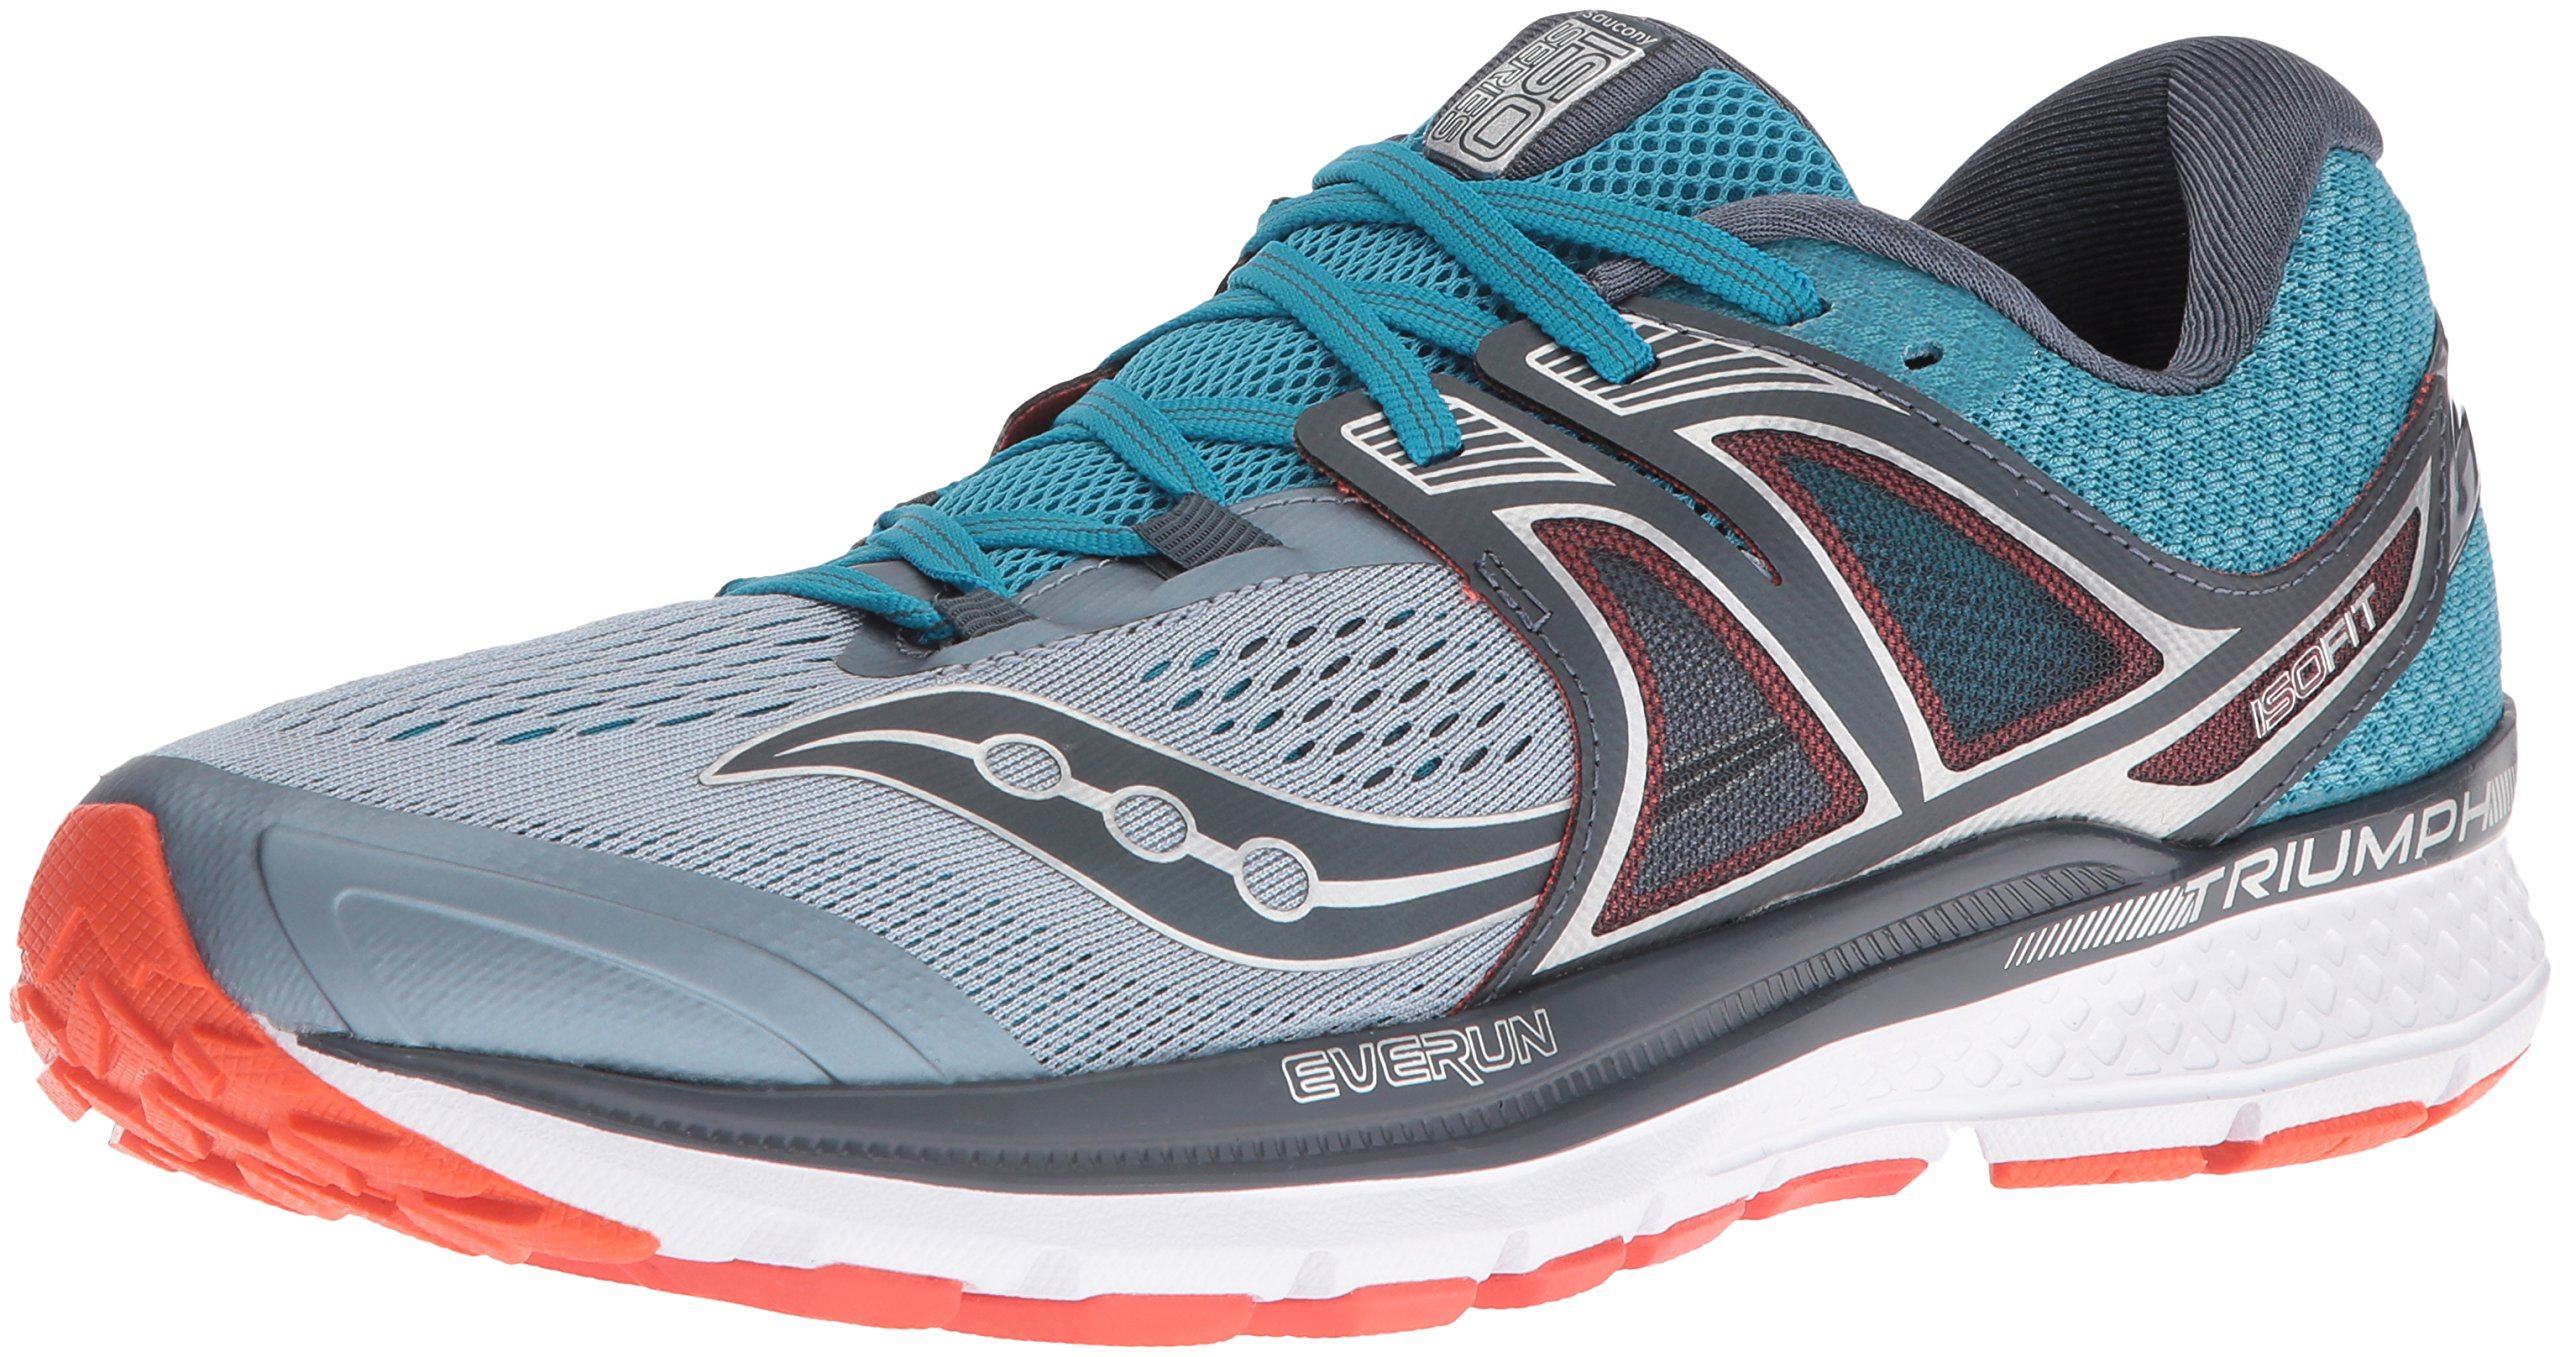 Saucony Men's Triumph ISO 3 Running Shoe, Grey/Blue/Re, 7 M US